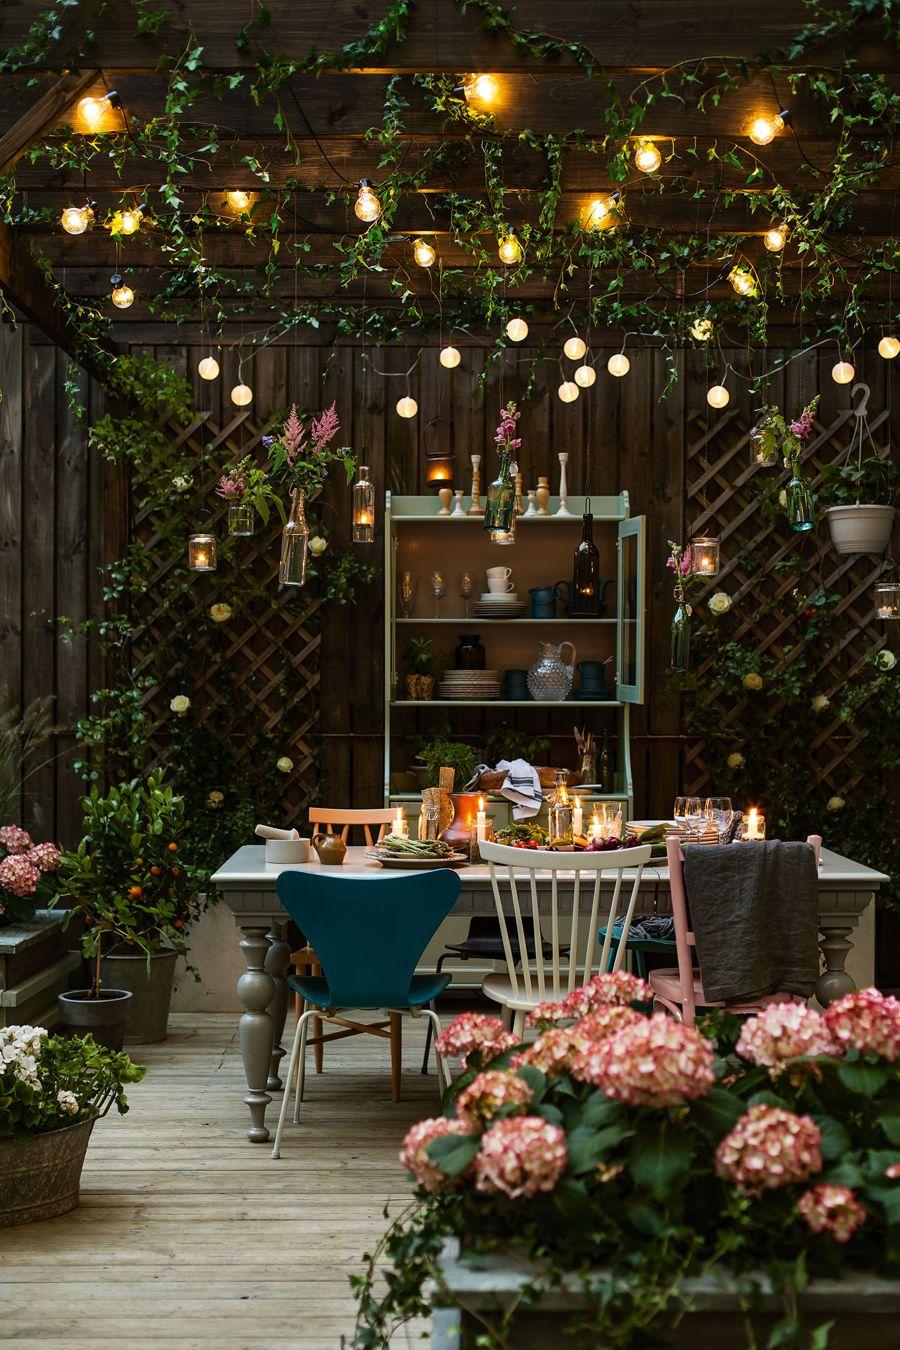 19 inspiring backyard and patio lighting project ideas | whimsical